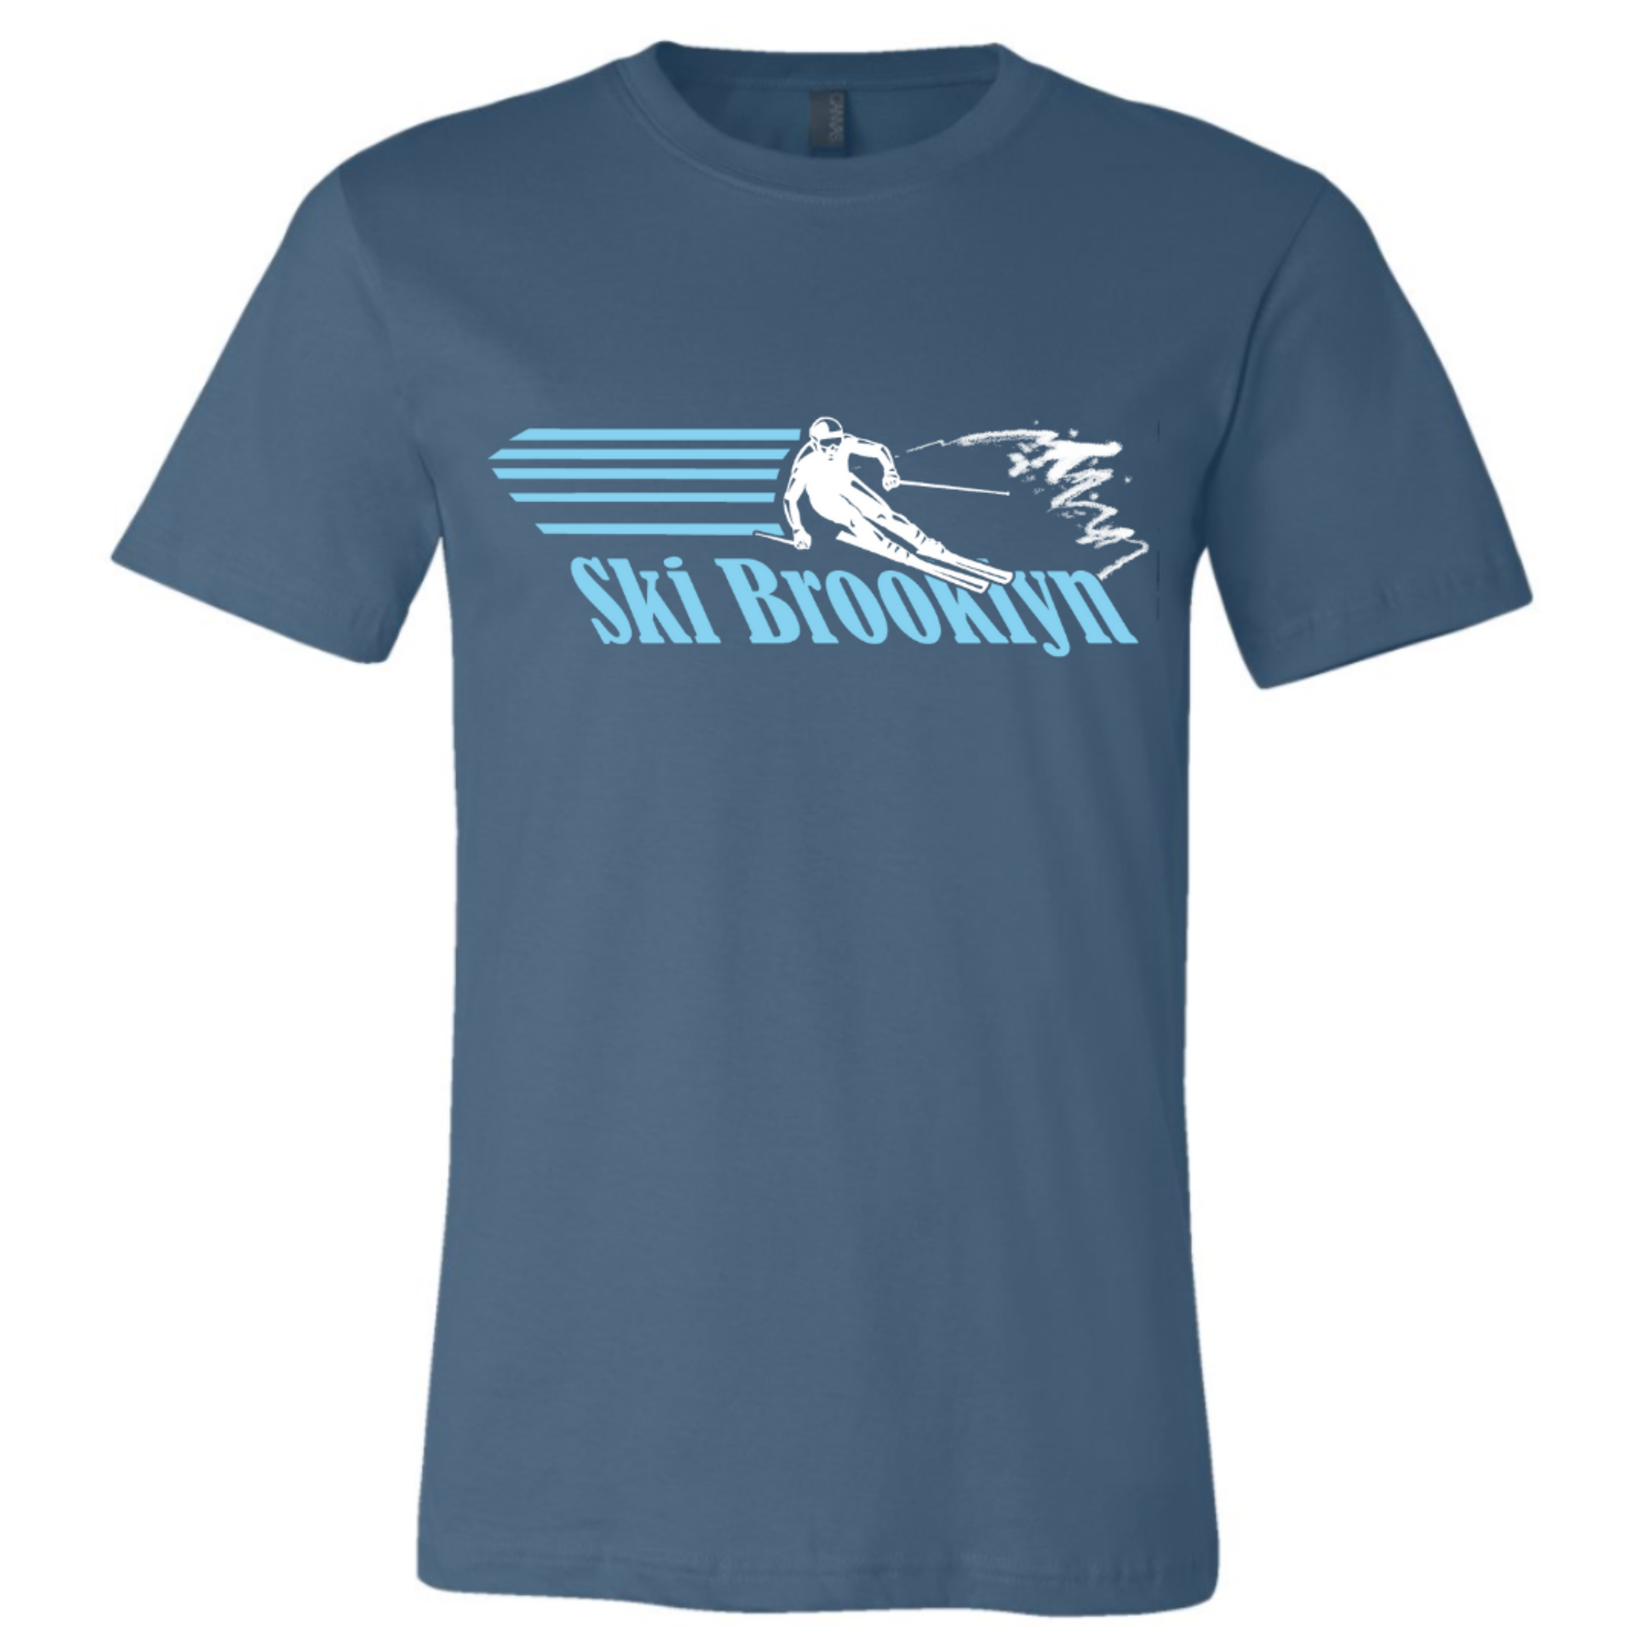 Exit9 Gift Emporium Ski Brooklyn T-Shirt